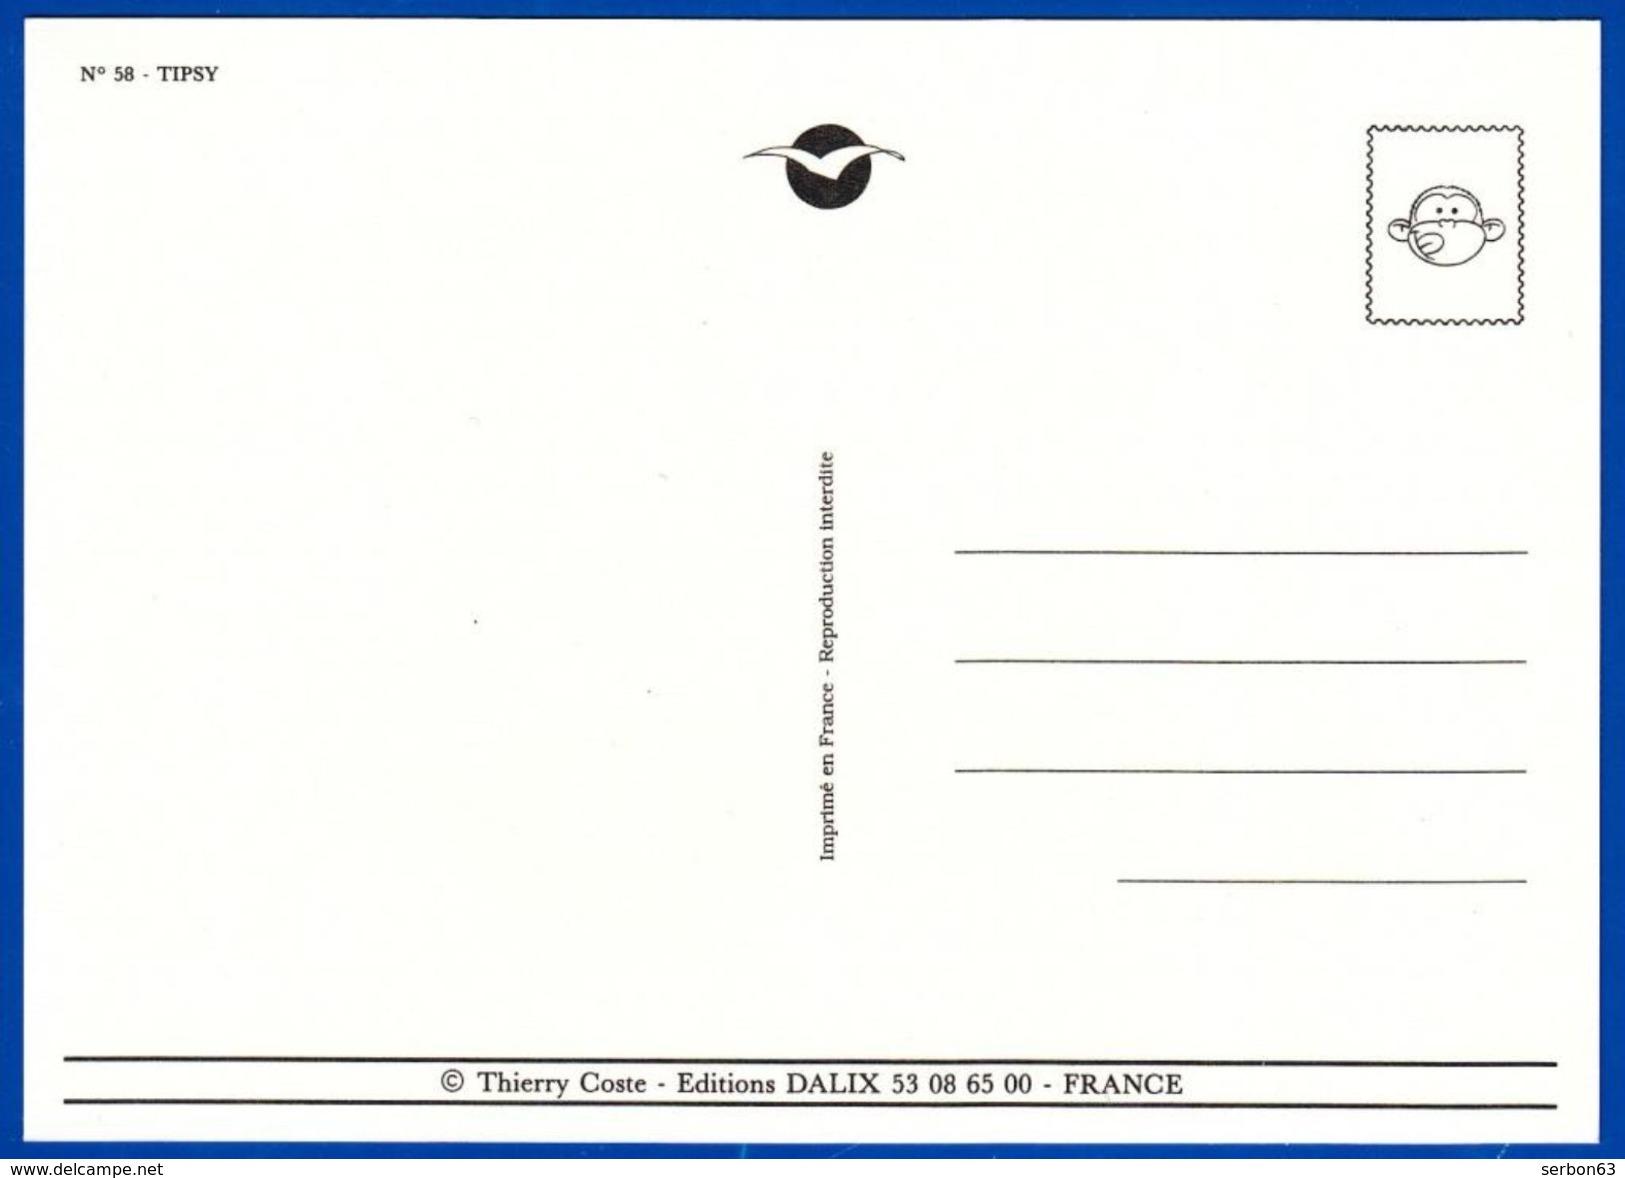 HUMORISTIQUE ILLUSTRATEUR TEE THIERRY COSTE N° 58 TIPSY CARTE POSTALE MODERNE EDITIONS DALIX - NOTRE SITE Serbon63 - Illustrateurs & Photographes